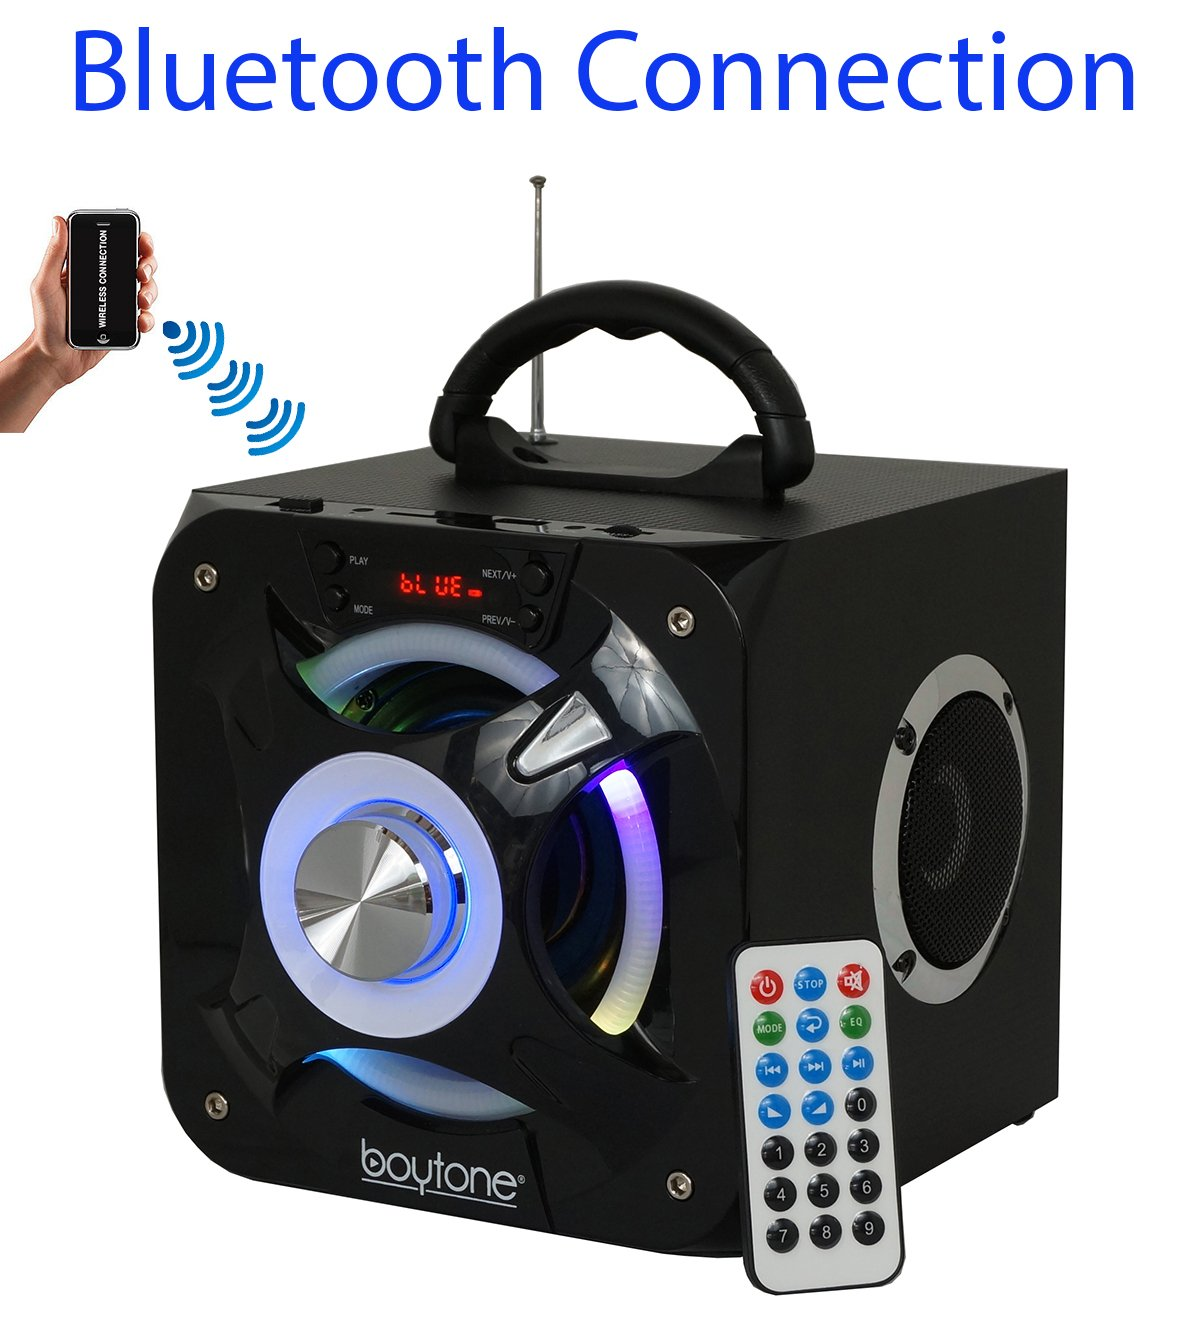 Boytone BT-32D ポータブル Bluetooth FMラジオ ステレオスピーカーシステム USBポート|SDカードスロット|MP3|AUXポート内蔵充電式バッテリー|フラッシュDJライト|リモートコントロール   B076VCYNZR